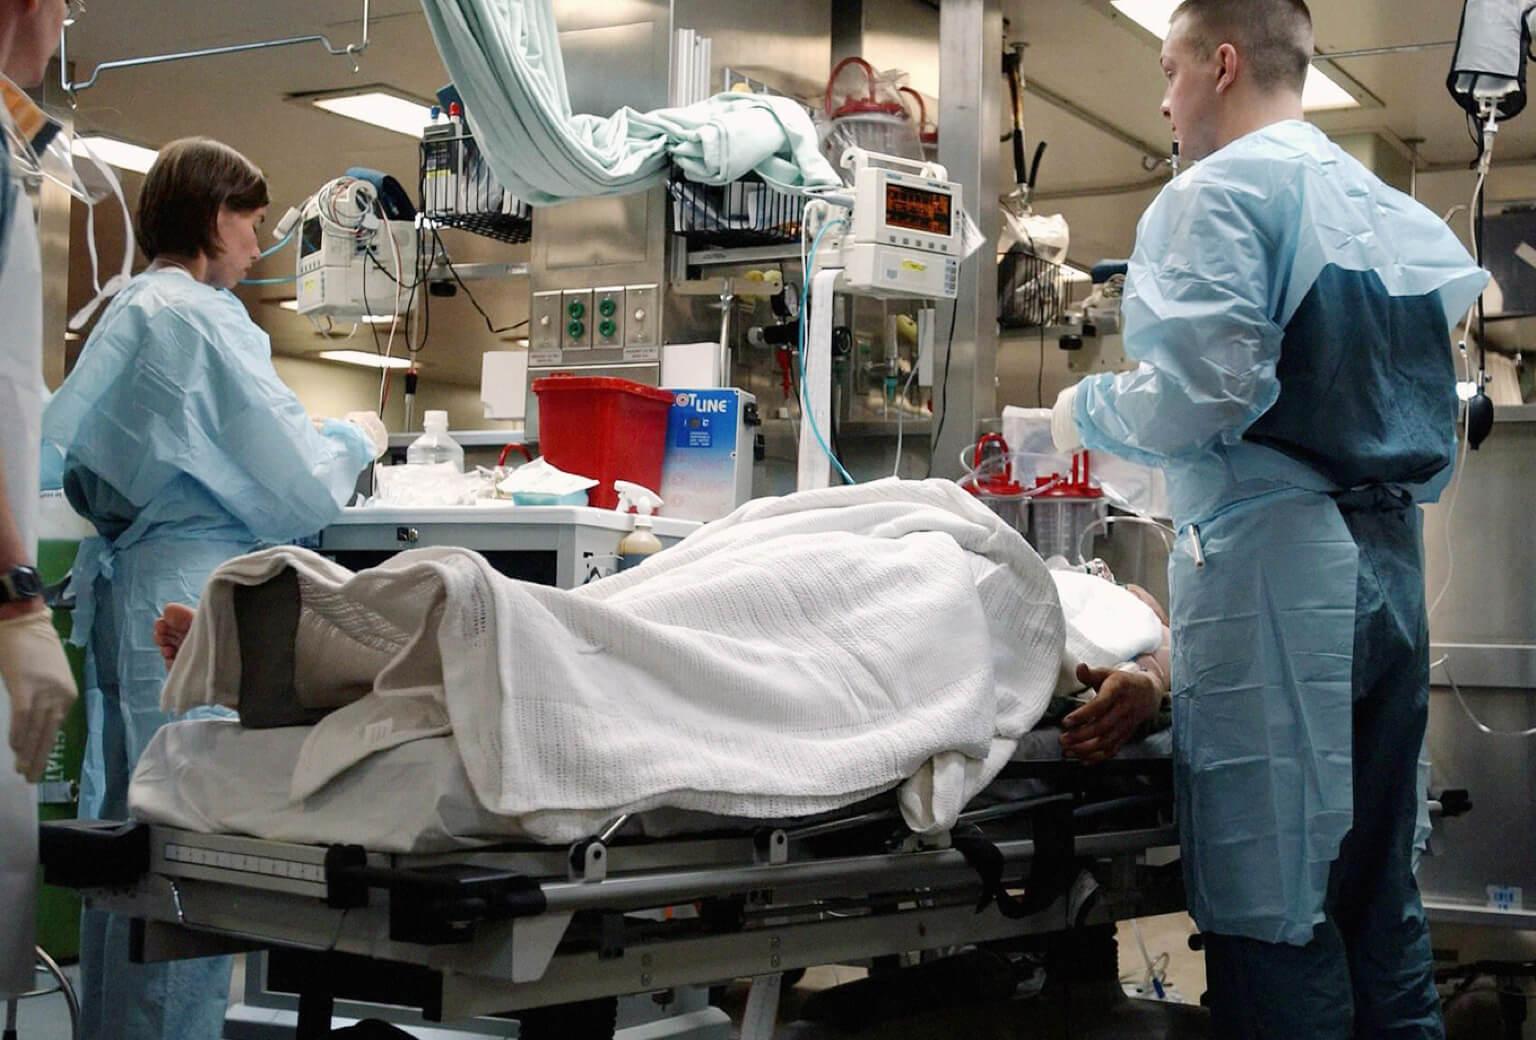 Two trauma nurses treat a patient lying on a gurney in a hospital.